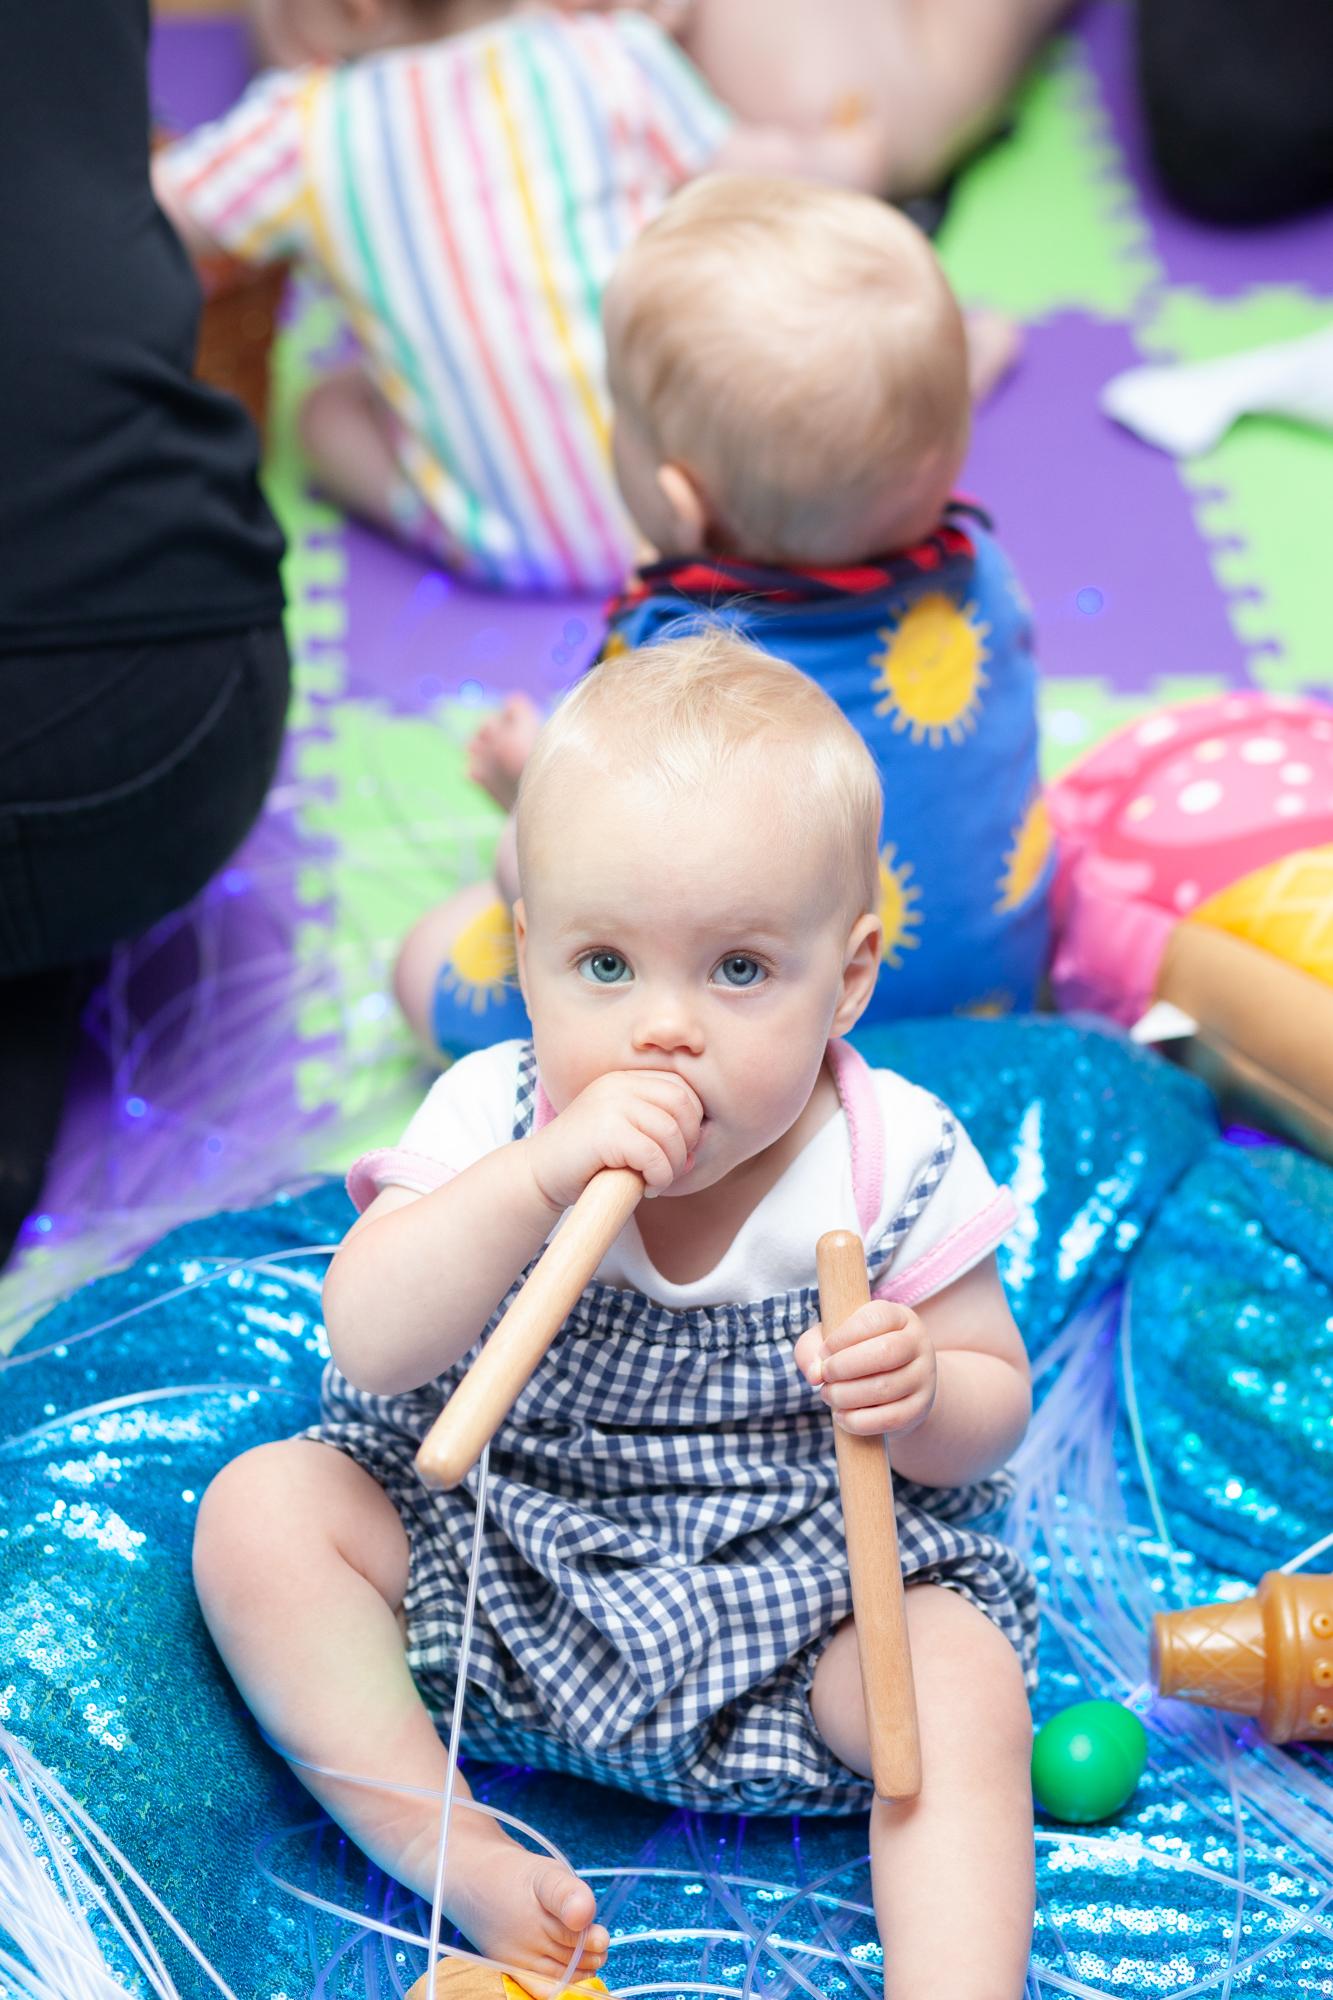 baby-class-photography-photographer-manchester-cheshire-14.jpg